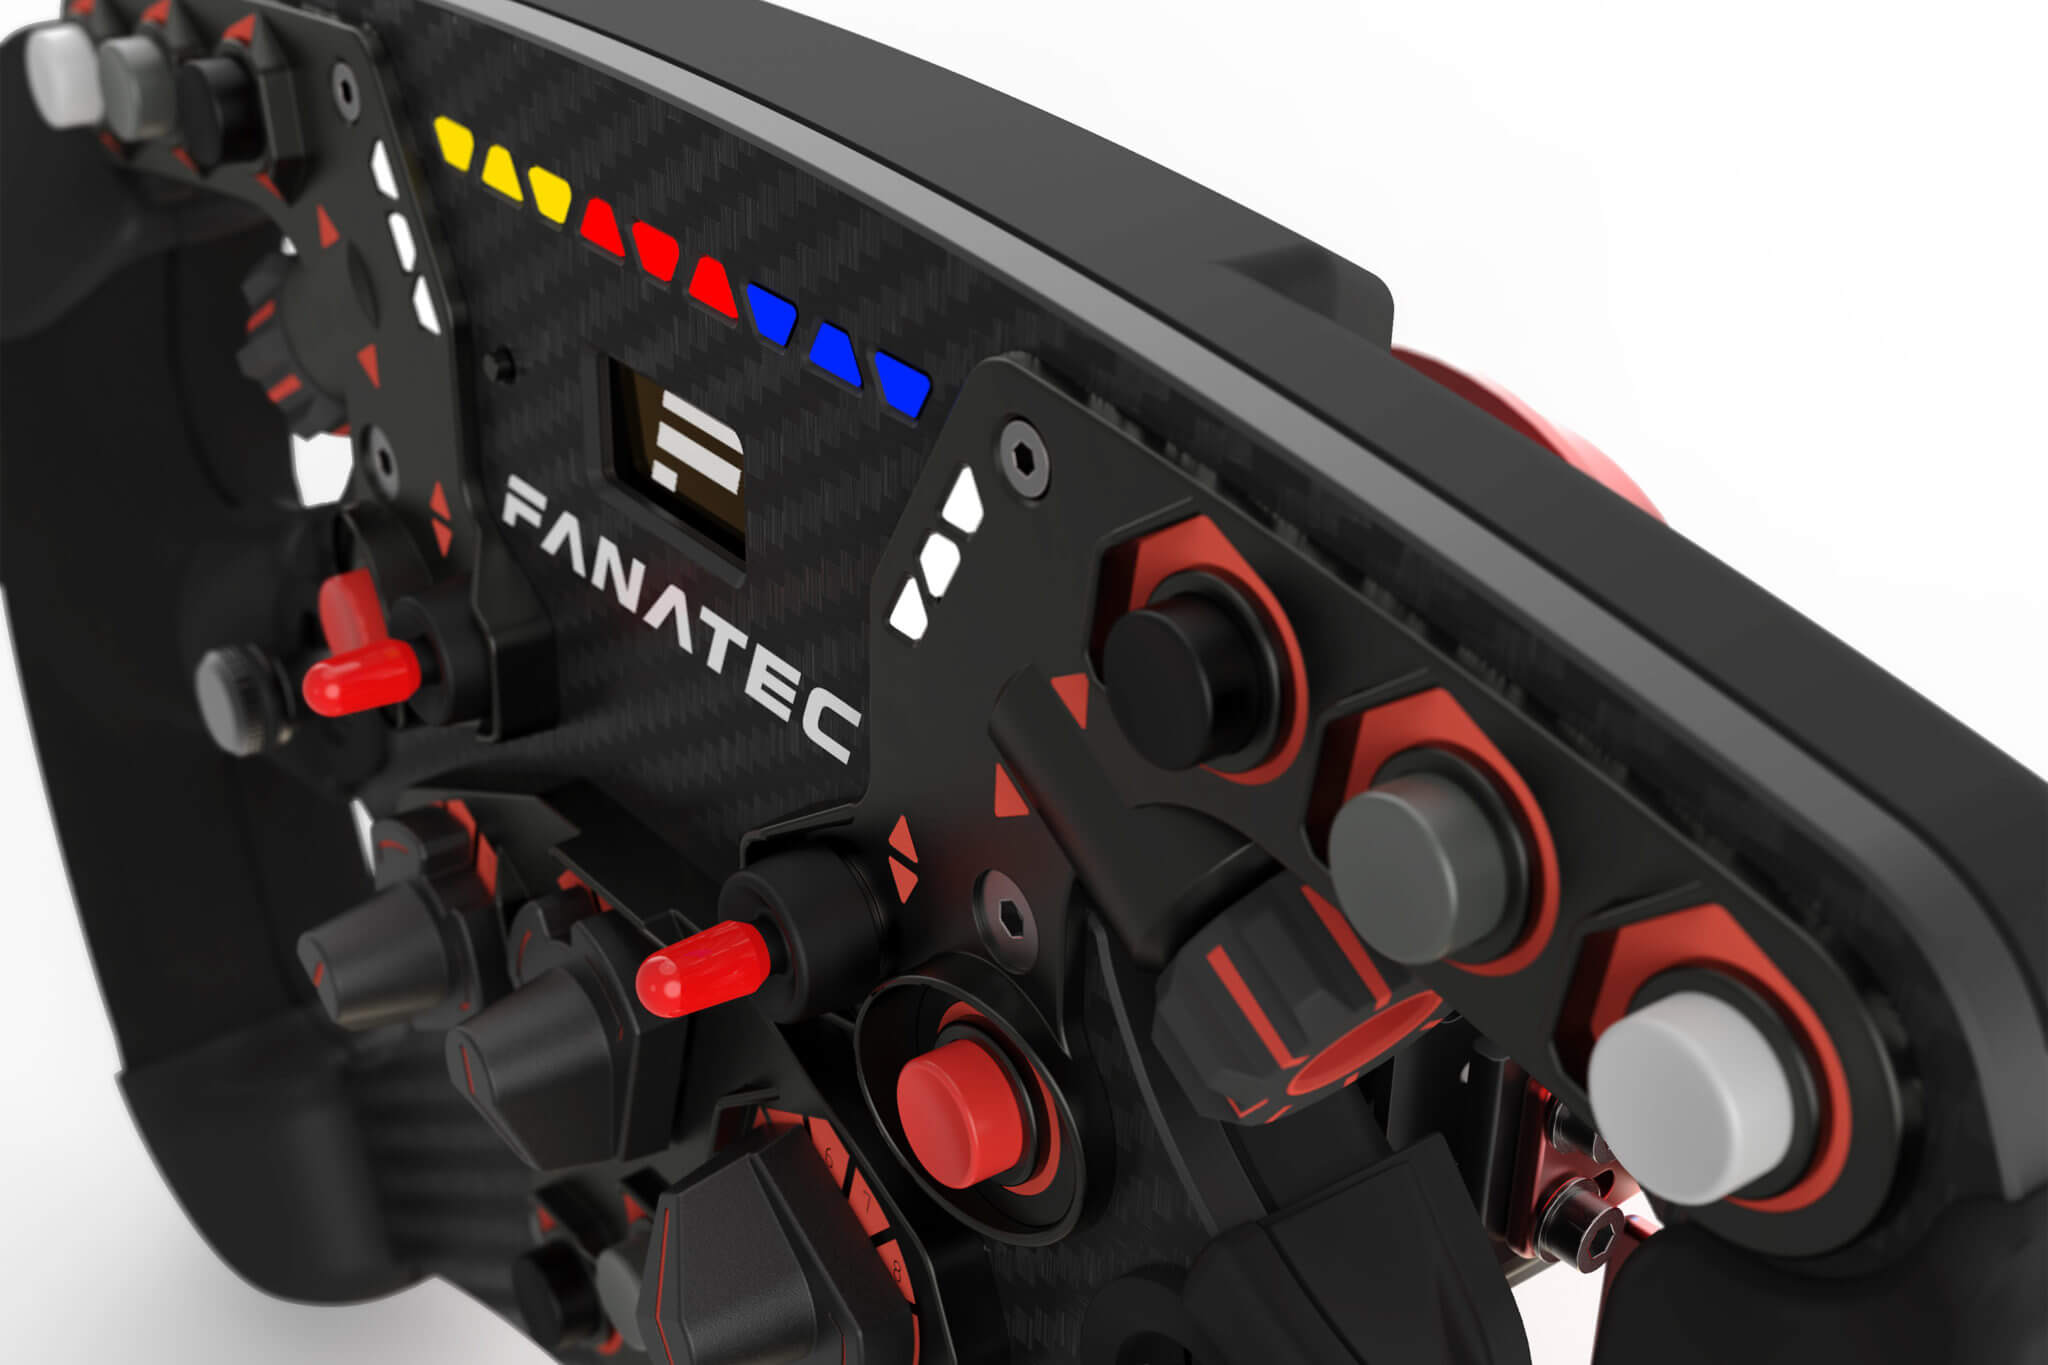 fanatec reveals new clubsport steering wheel formula v2. Black Bedroom Furniture Sets. Home Design Ideas